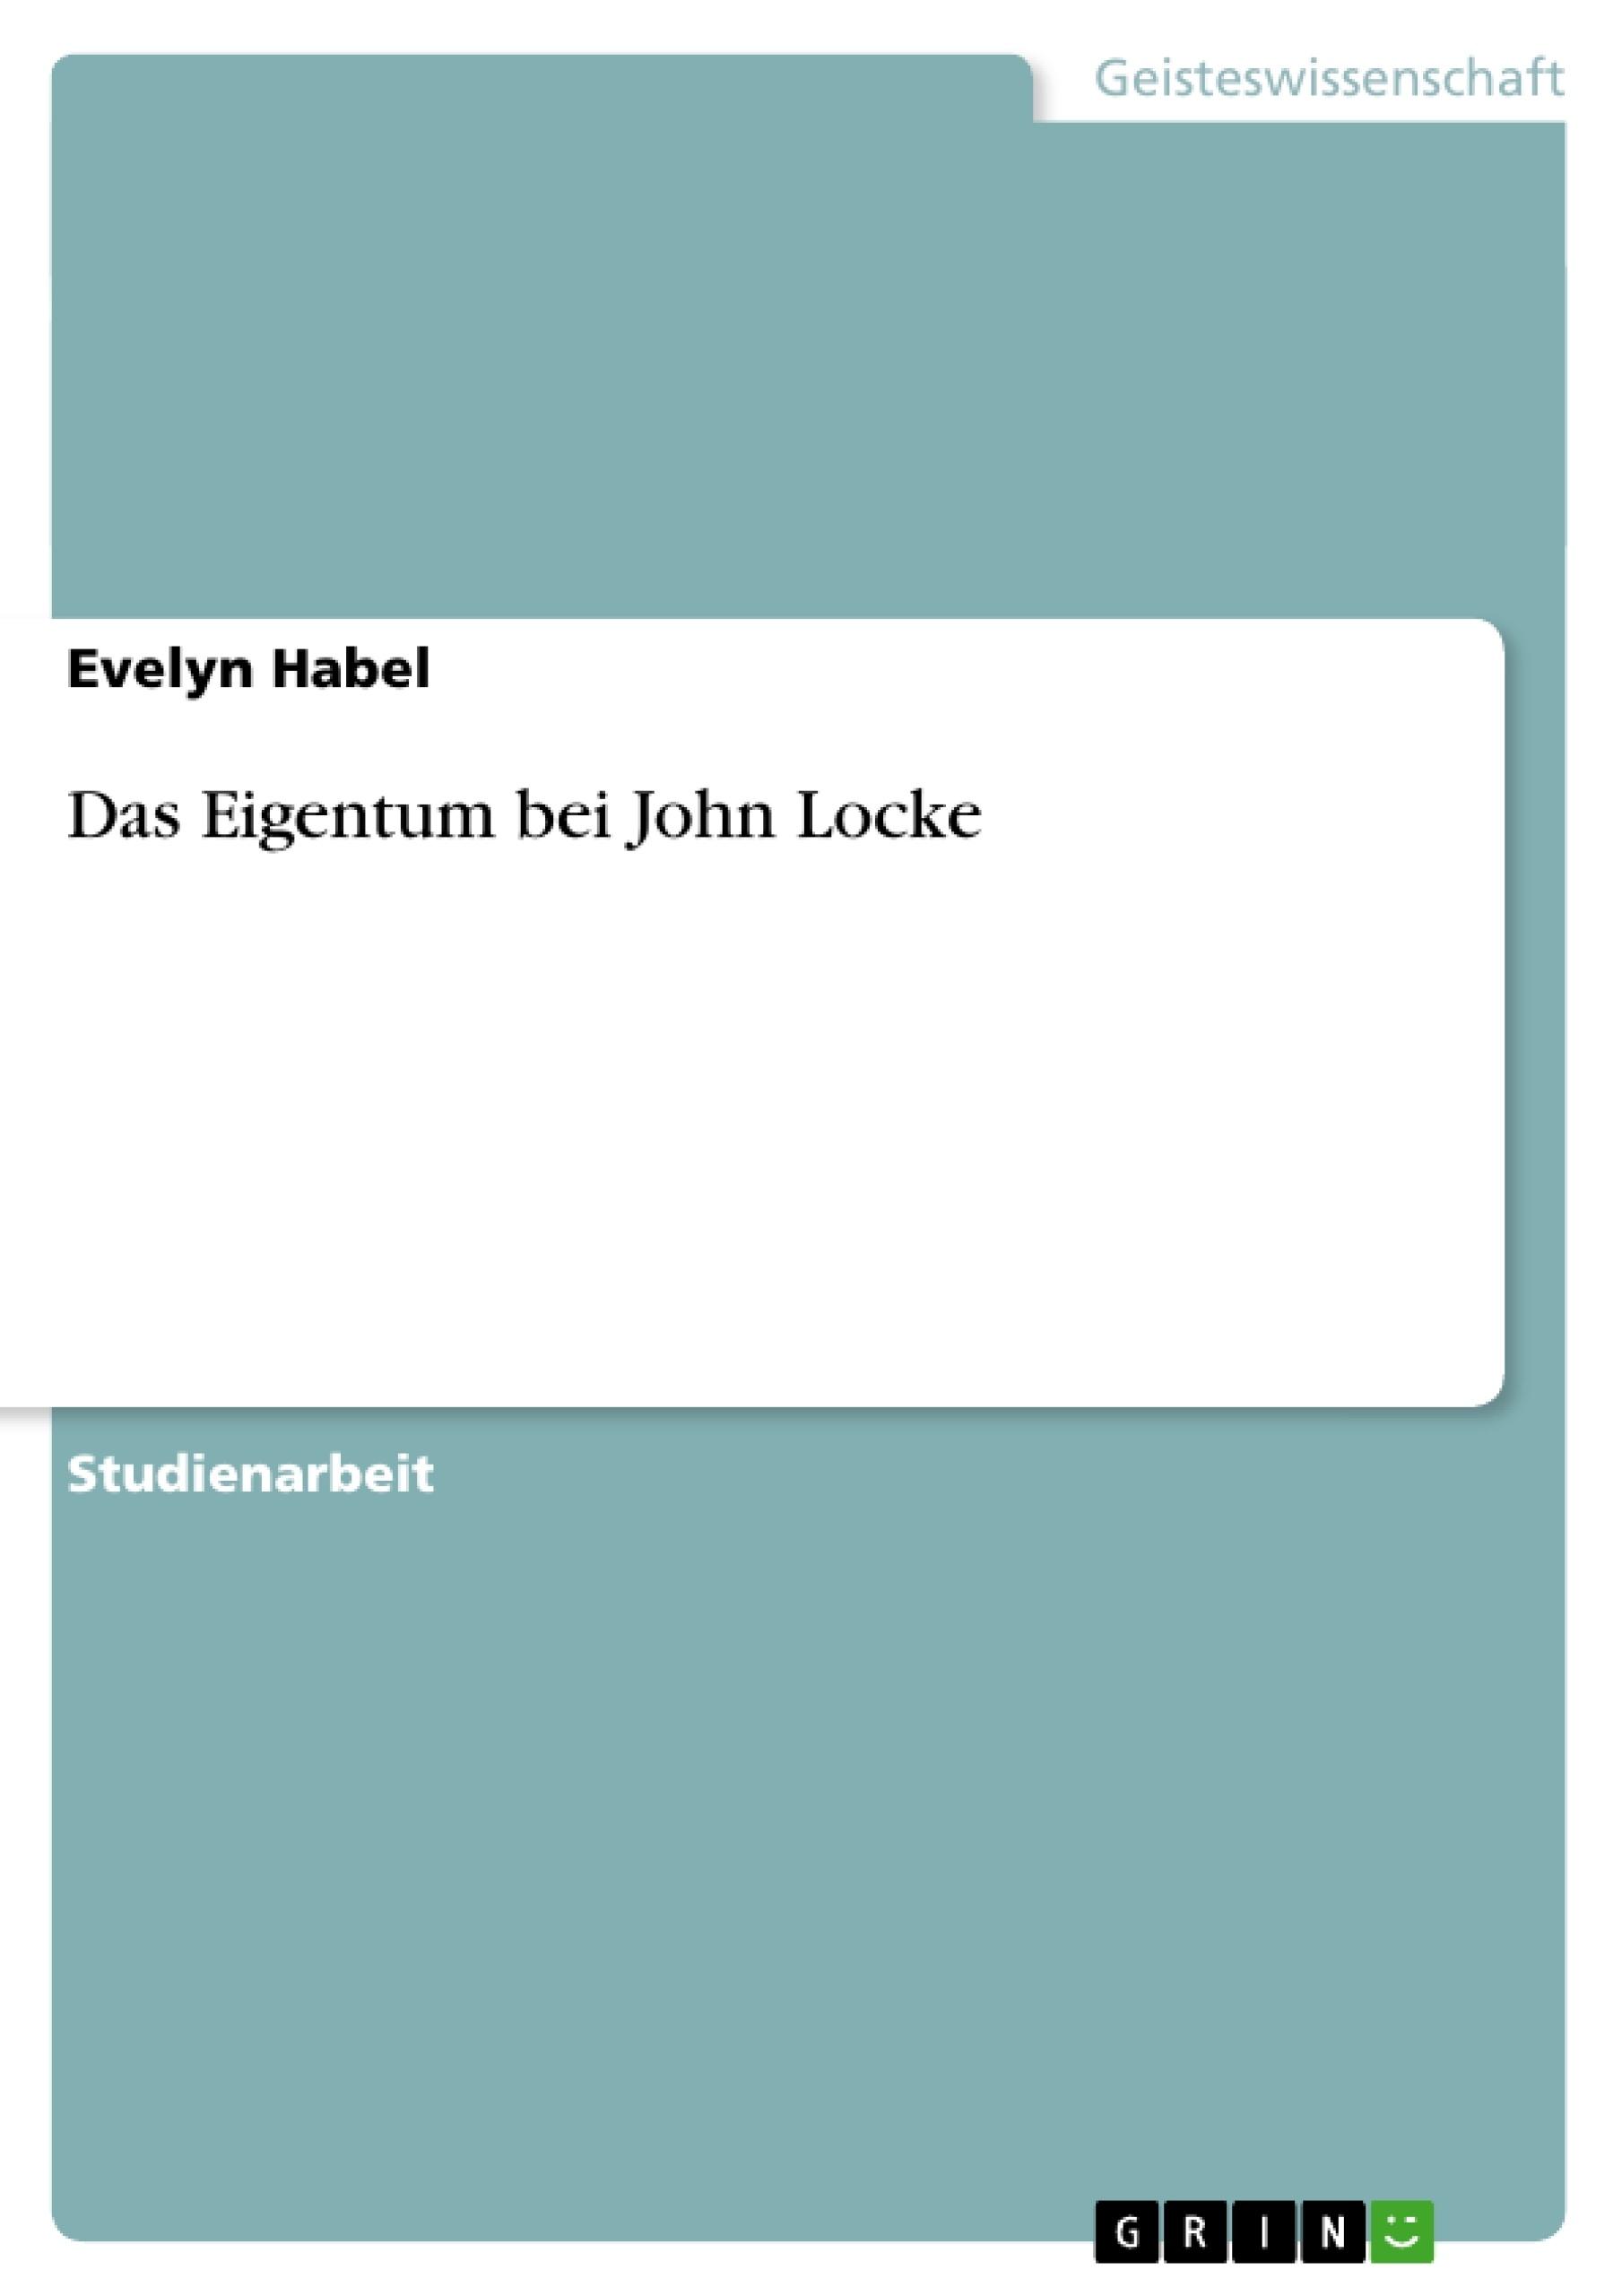 Titel: Das Eigentum bei  John Locke